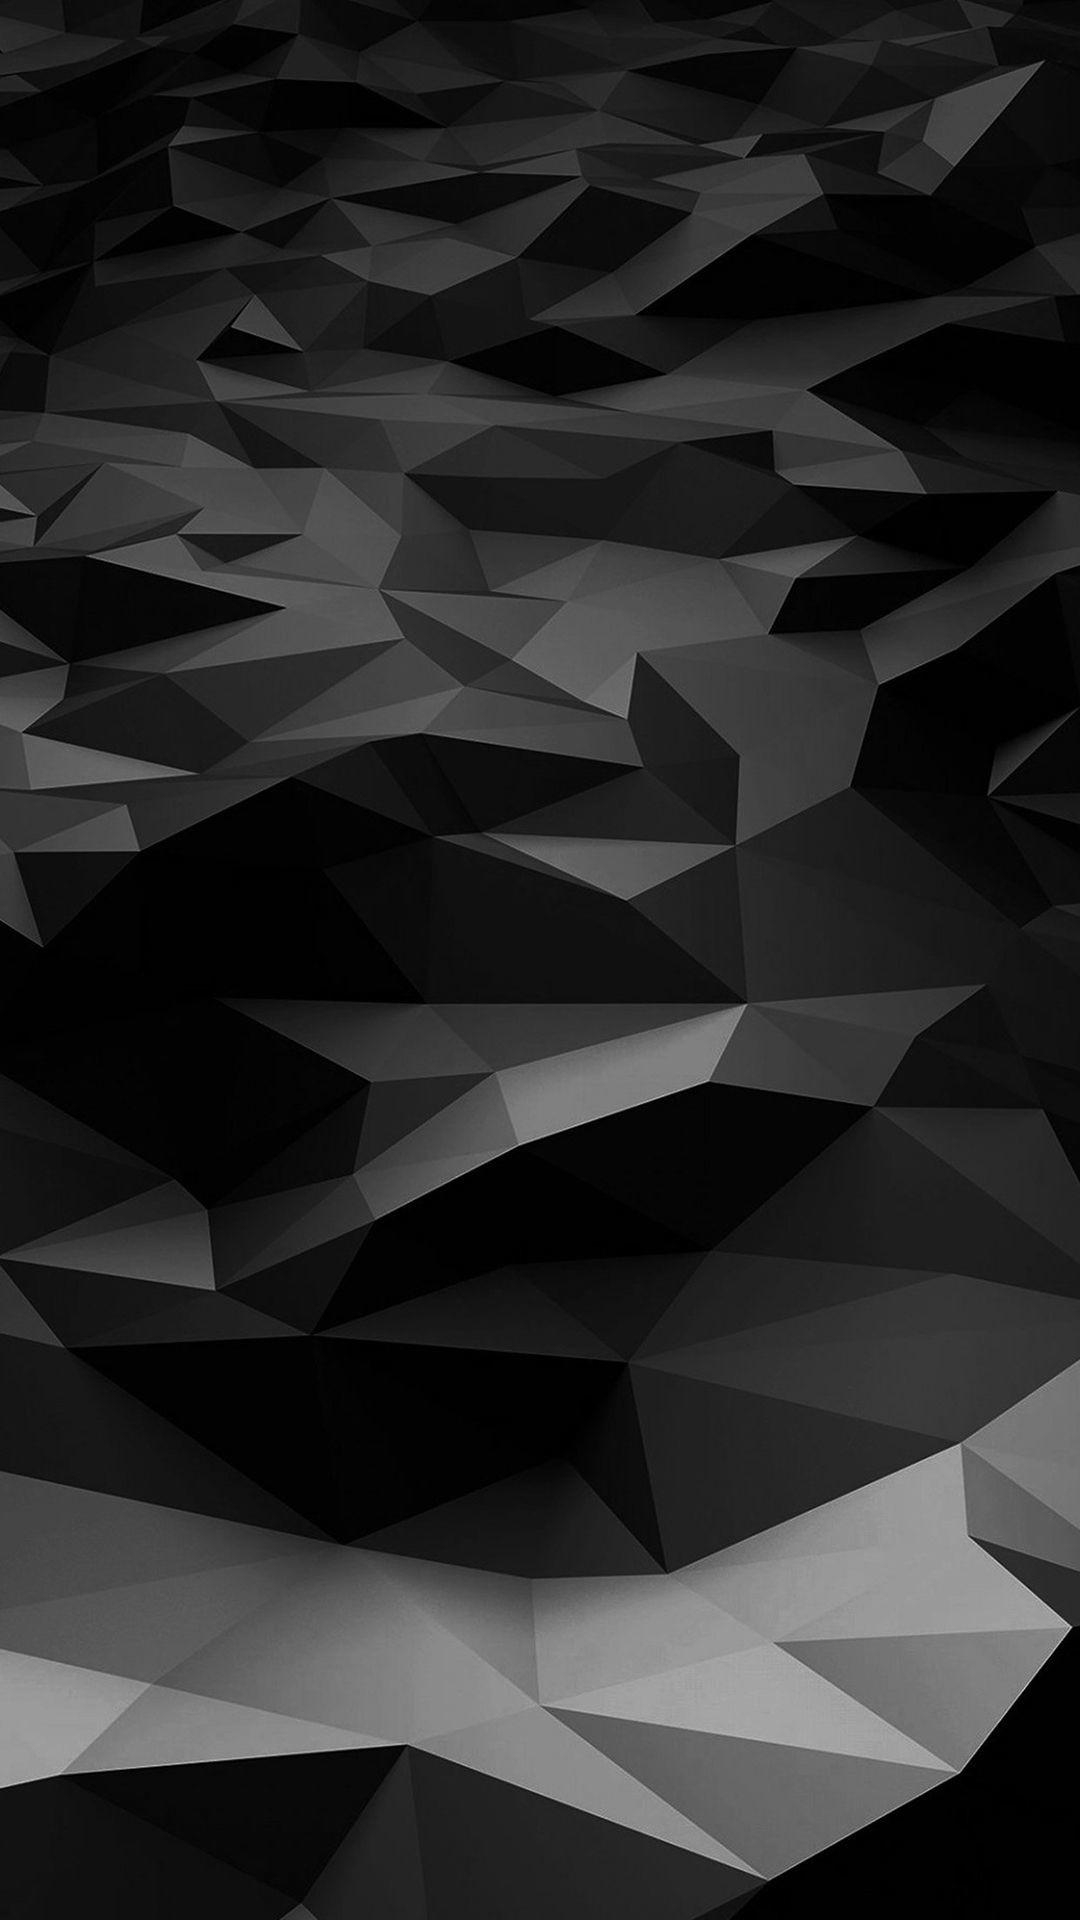 low poly art dark black pattern iphone 6 wallpapers download